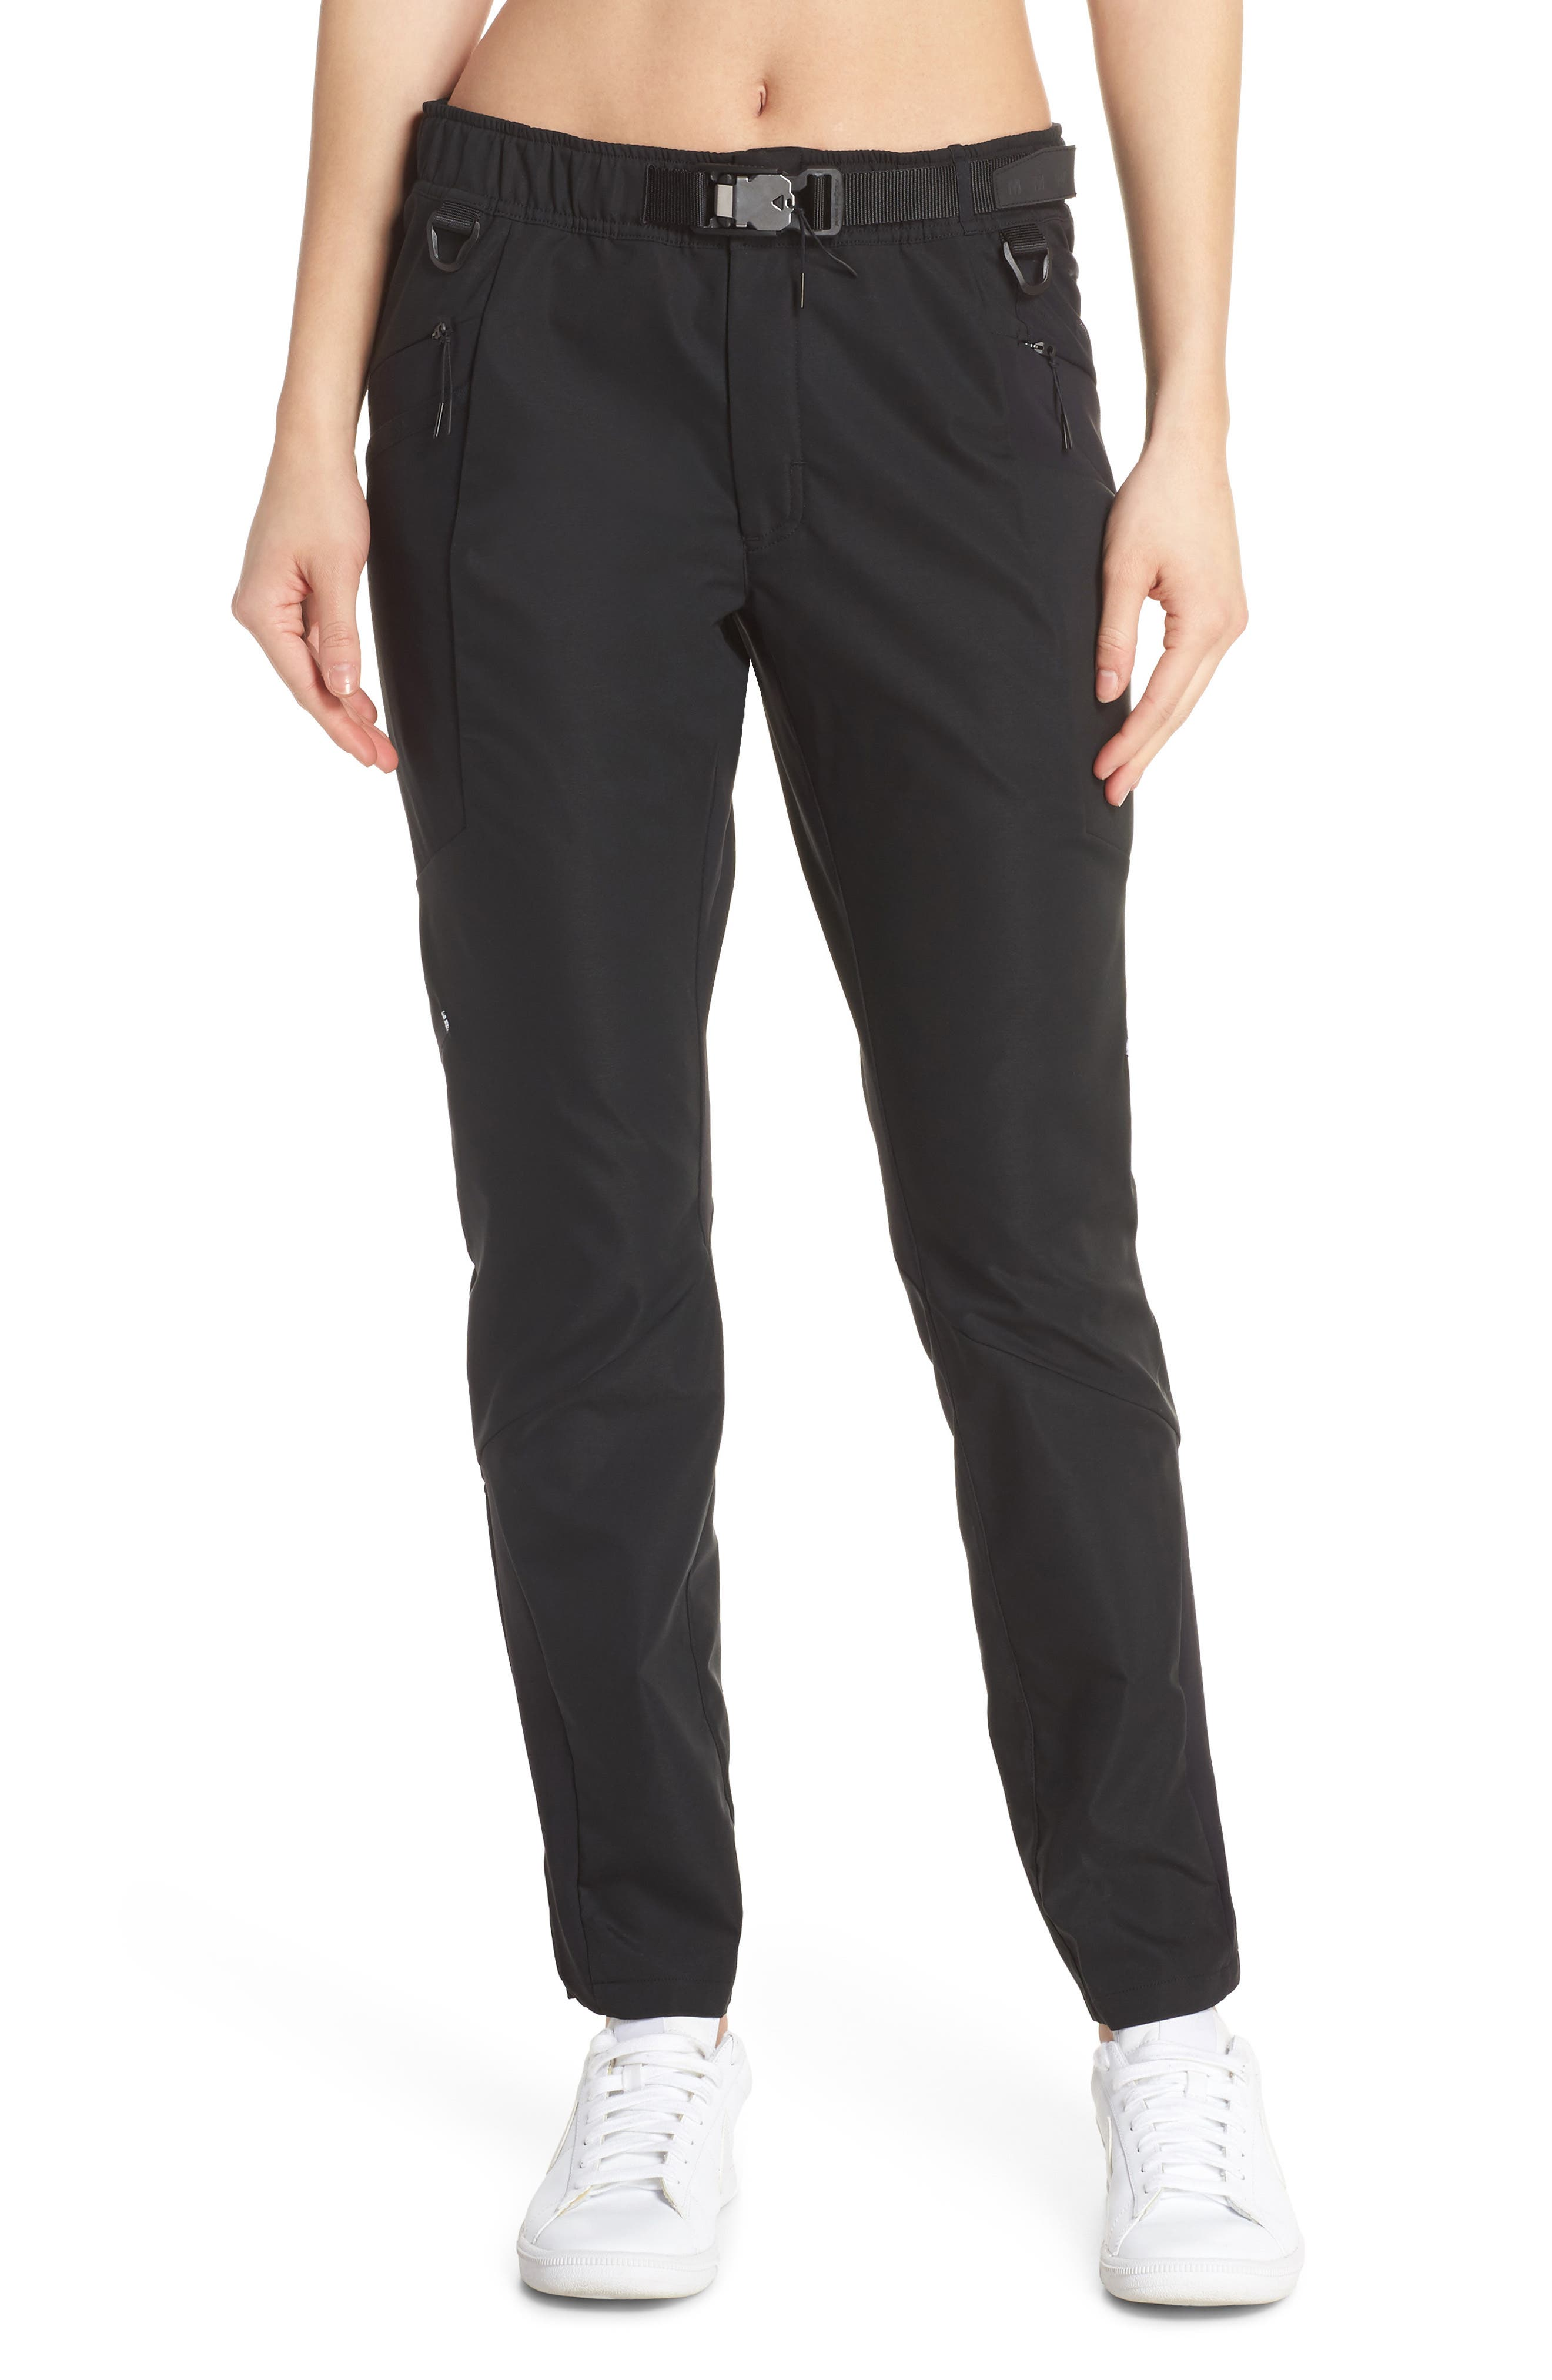 NIKE NikeLab x MMW Women's Pants, Main, color, 010